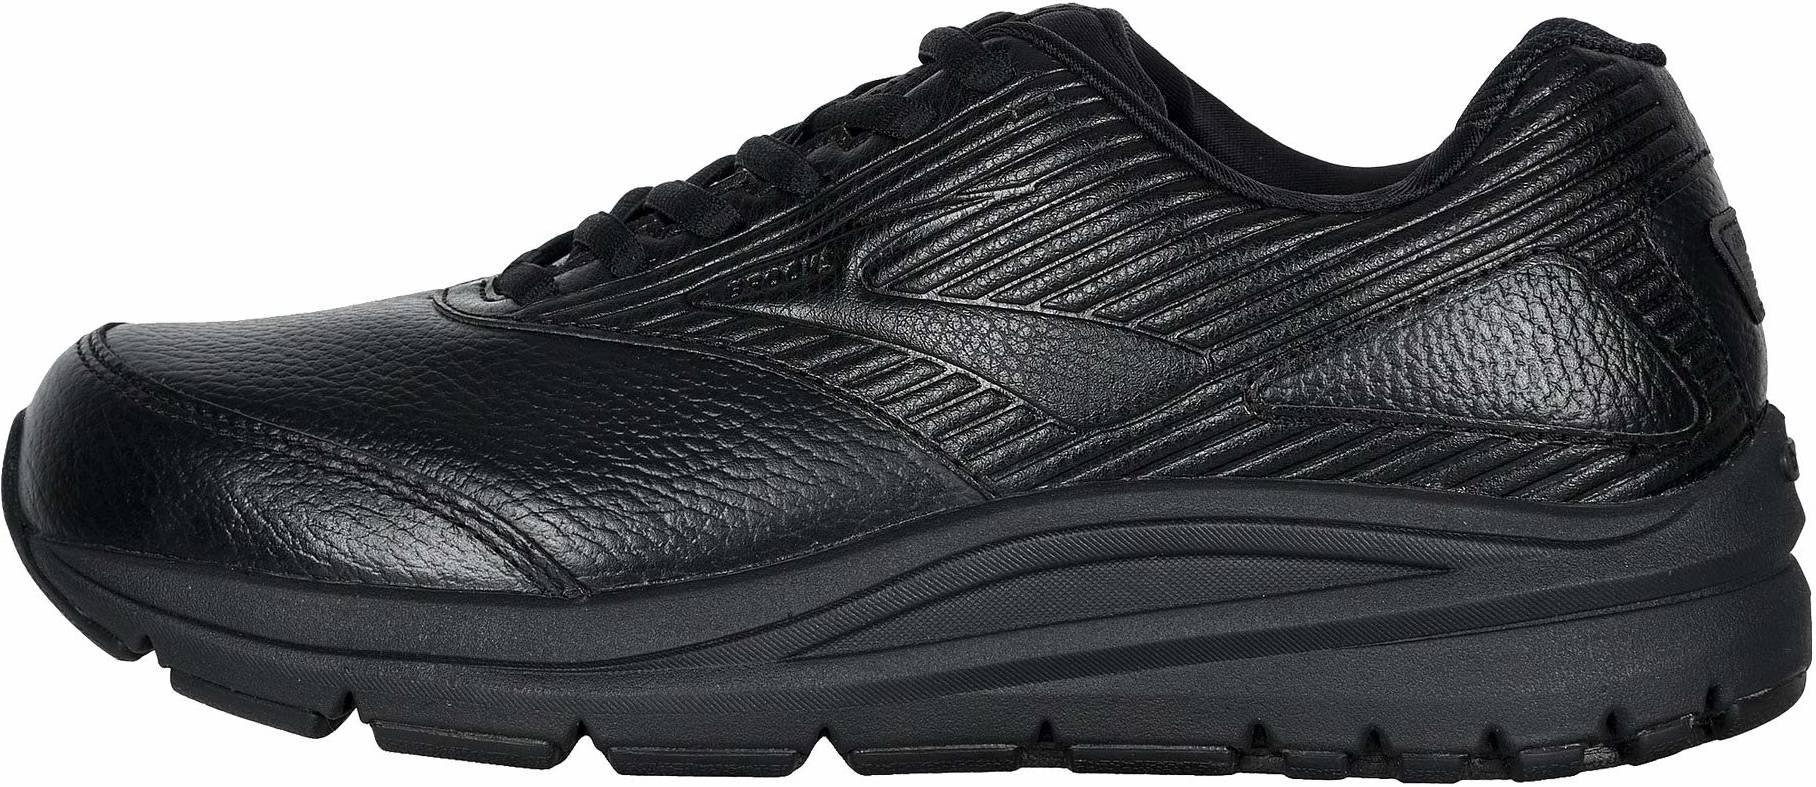 Chaussures de Randonn/ée Homme Brooks Addiction Walker 2